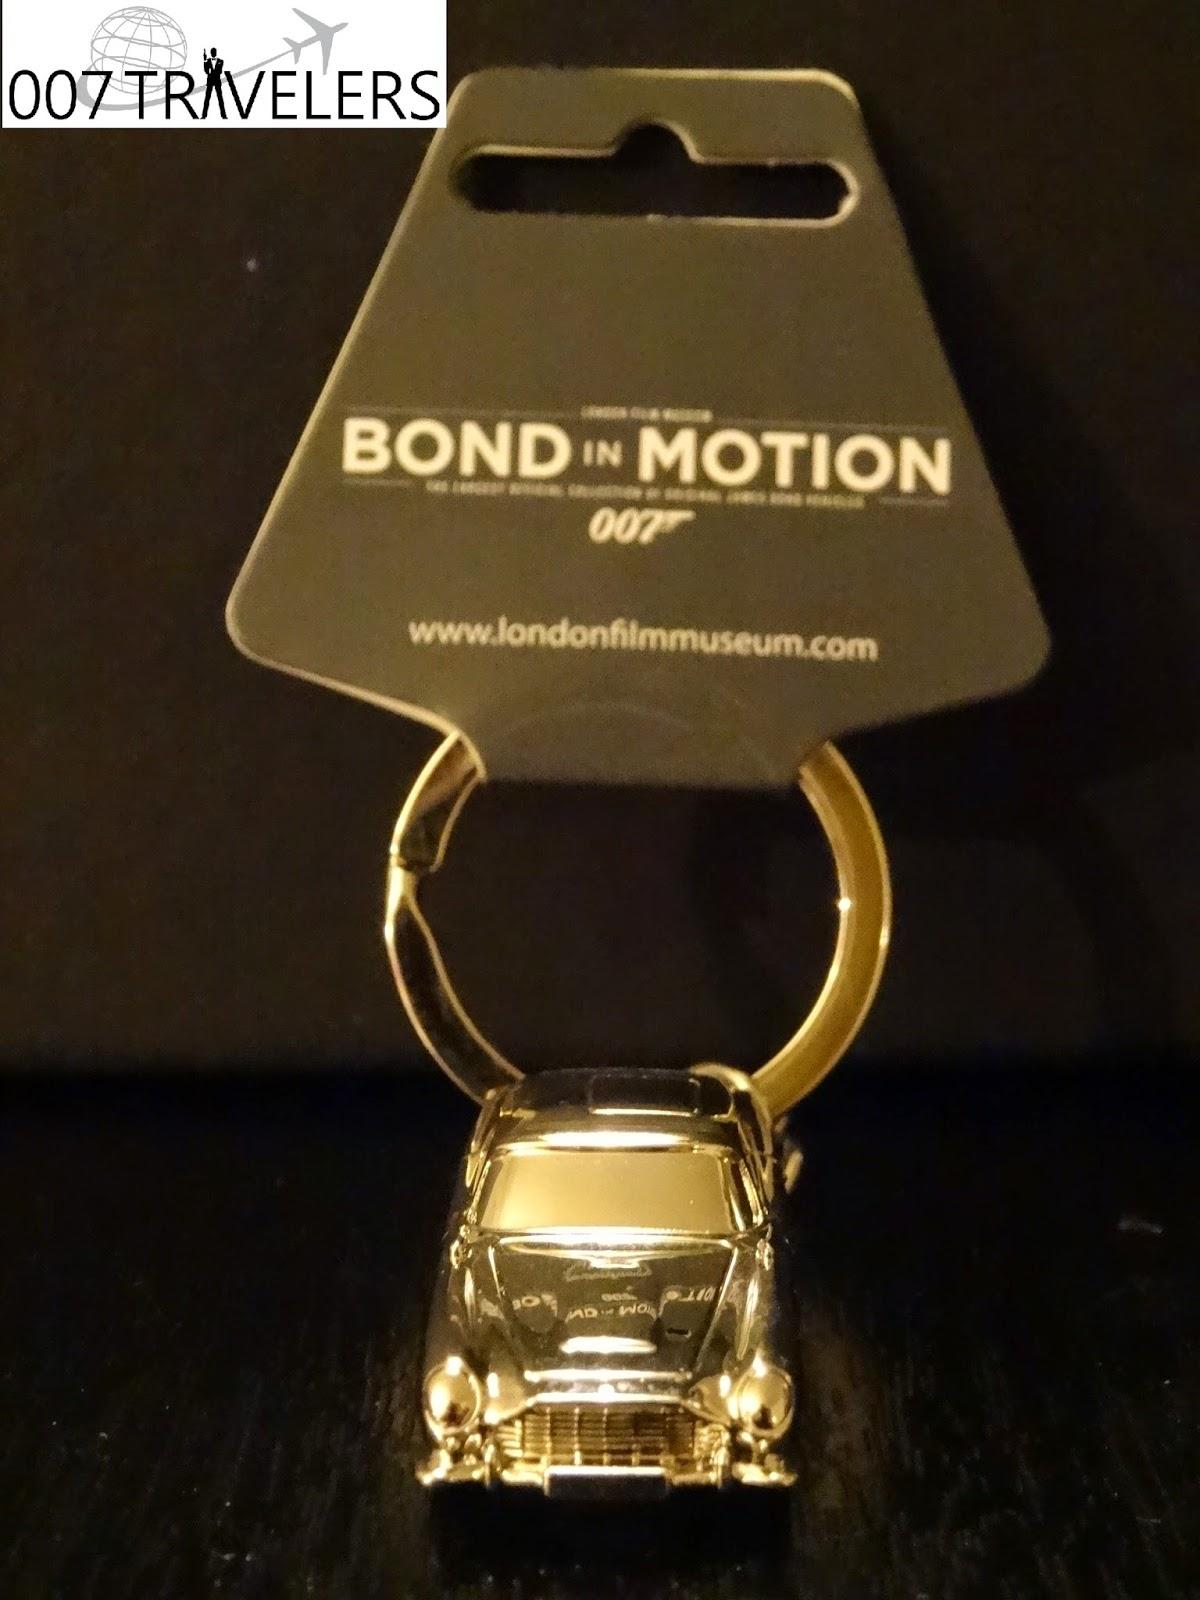 007 TRAVELERS 007 Item Bond in Motion 007 Aston Martin DB5 keyring